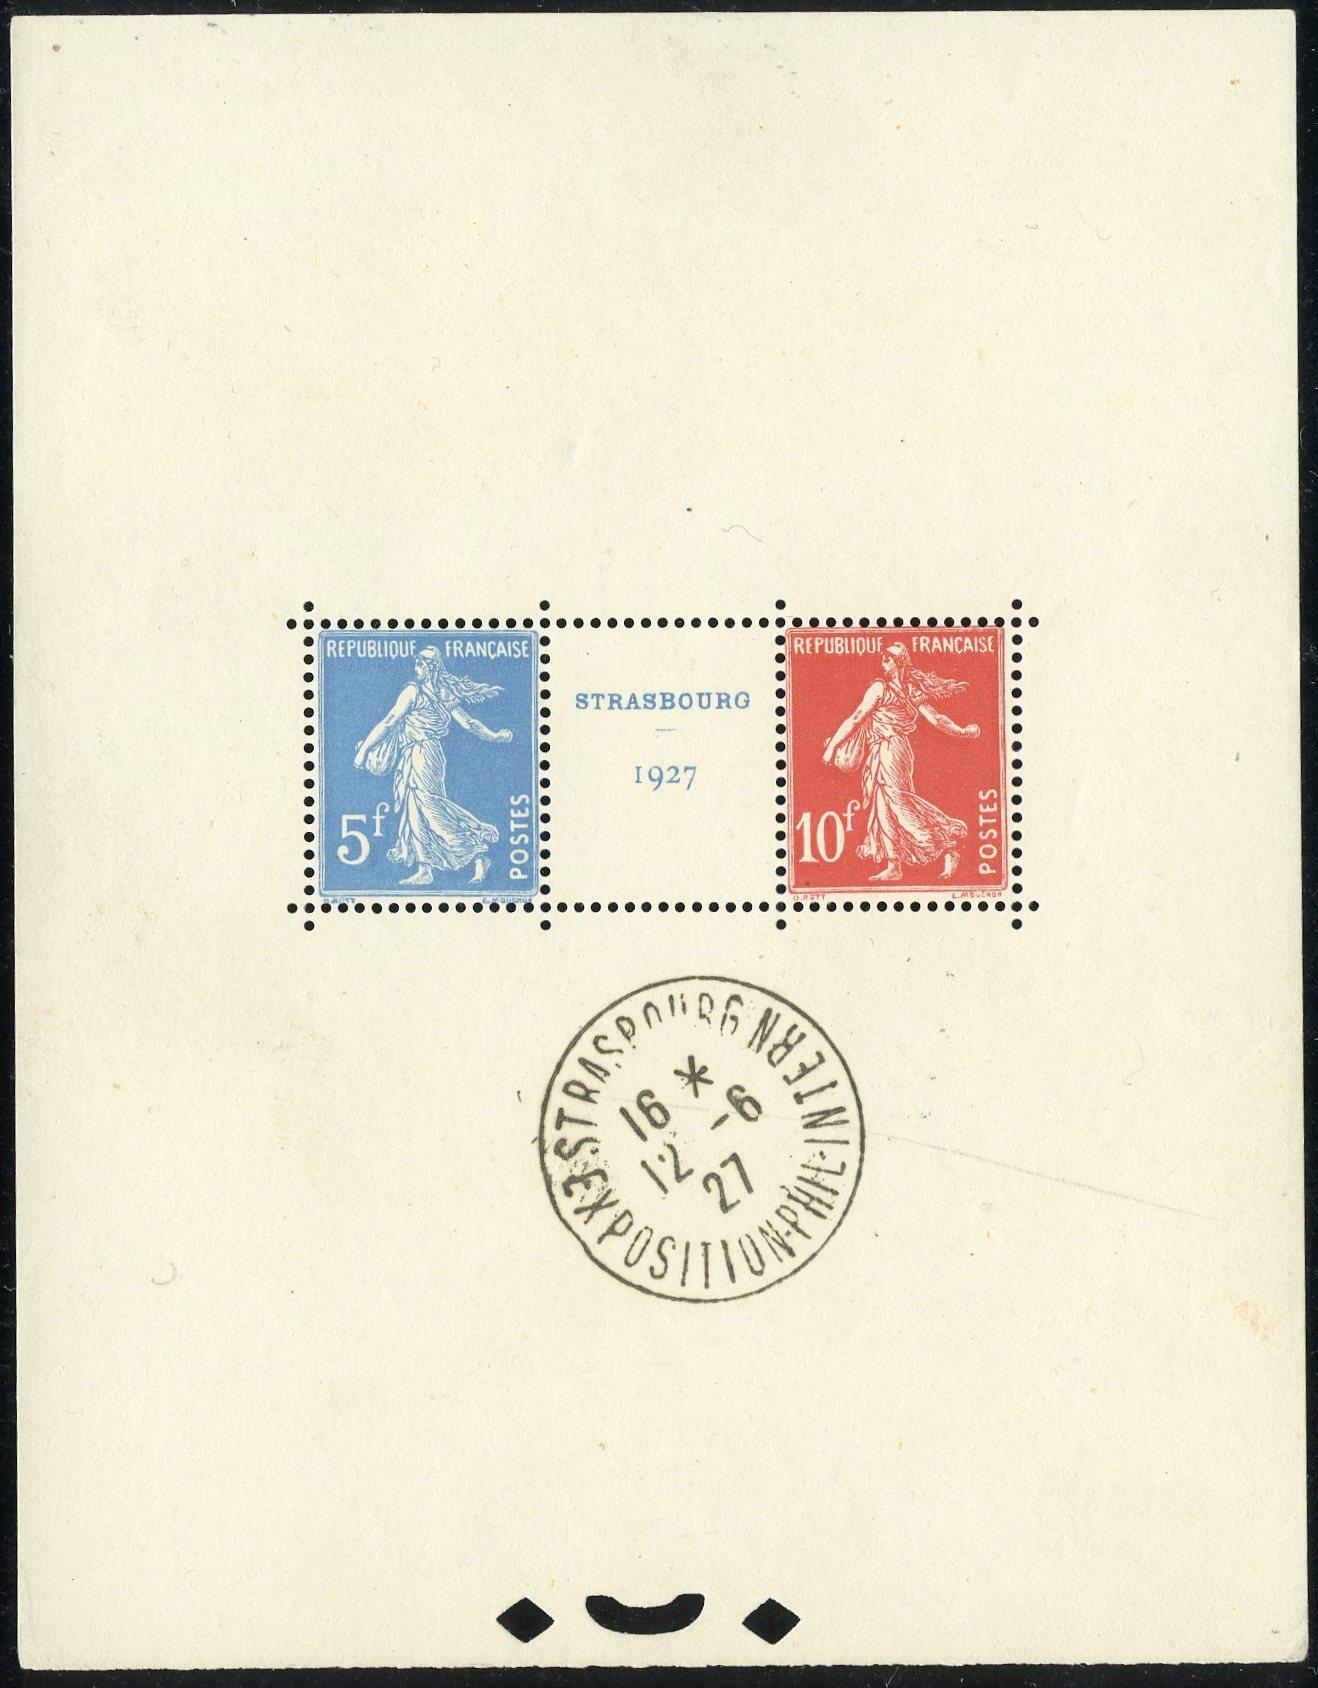 Lot 6 - FRANCE (See also #43/45)  -  Tel Aviv Stamps Ltd. Auction #49